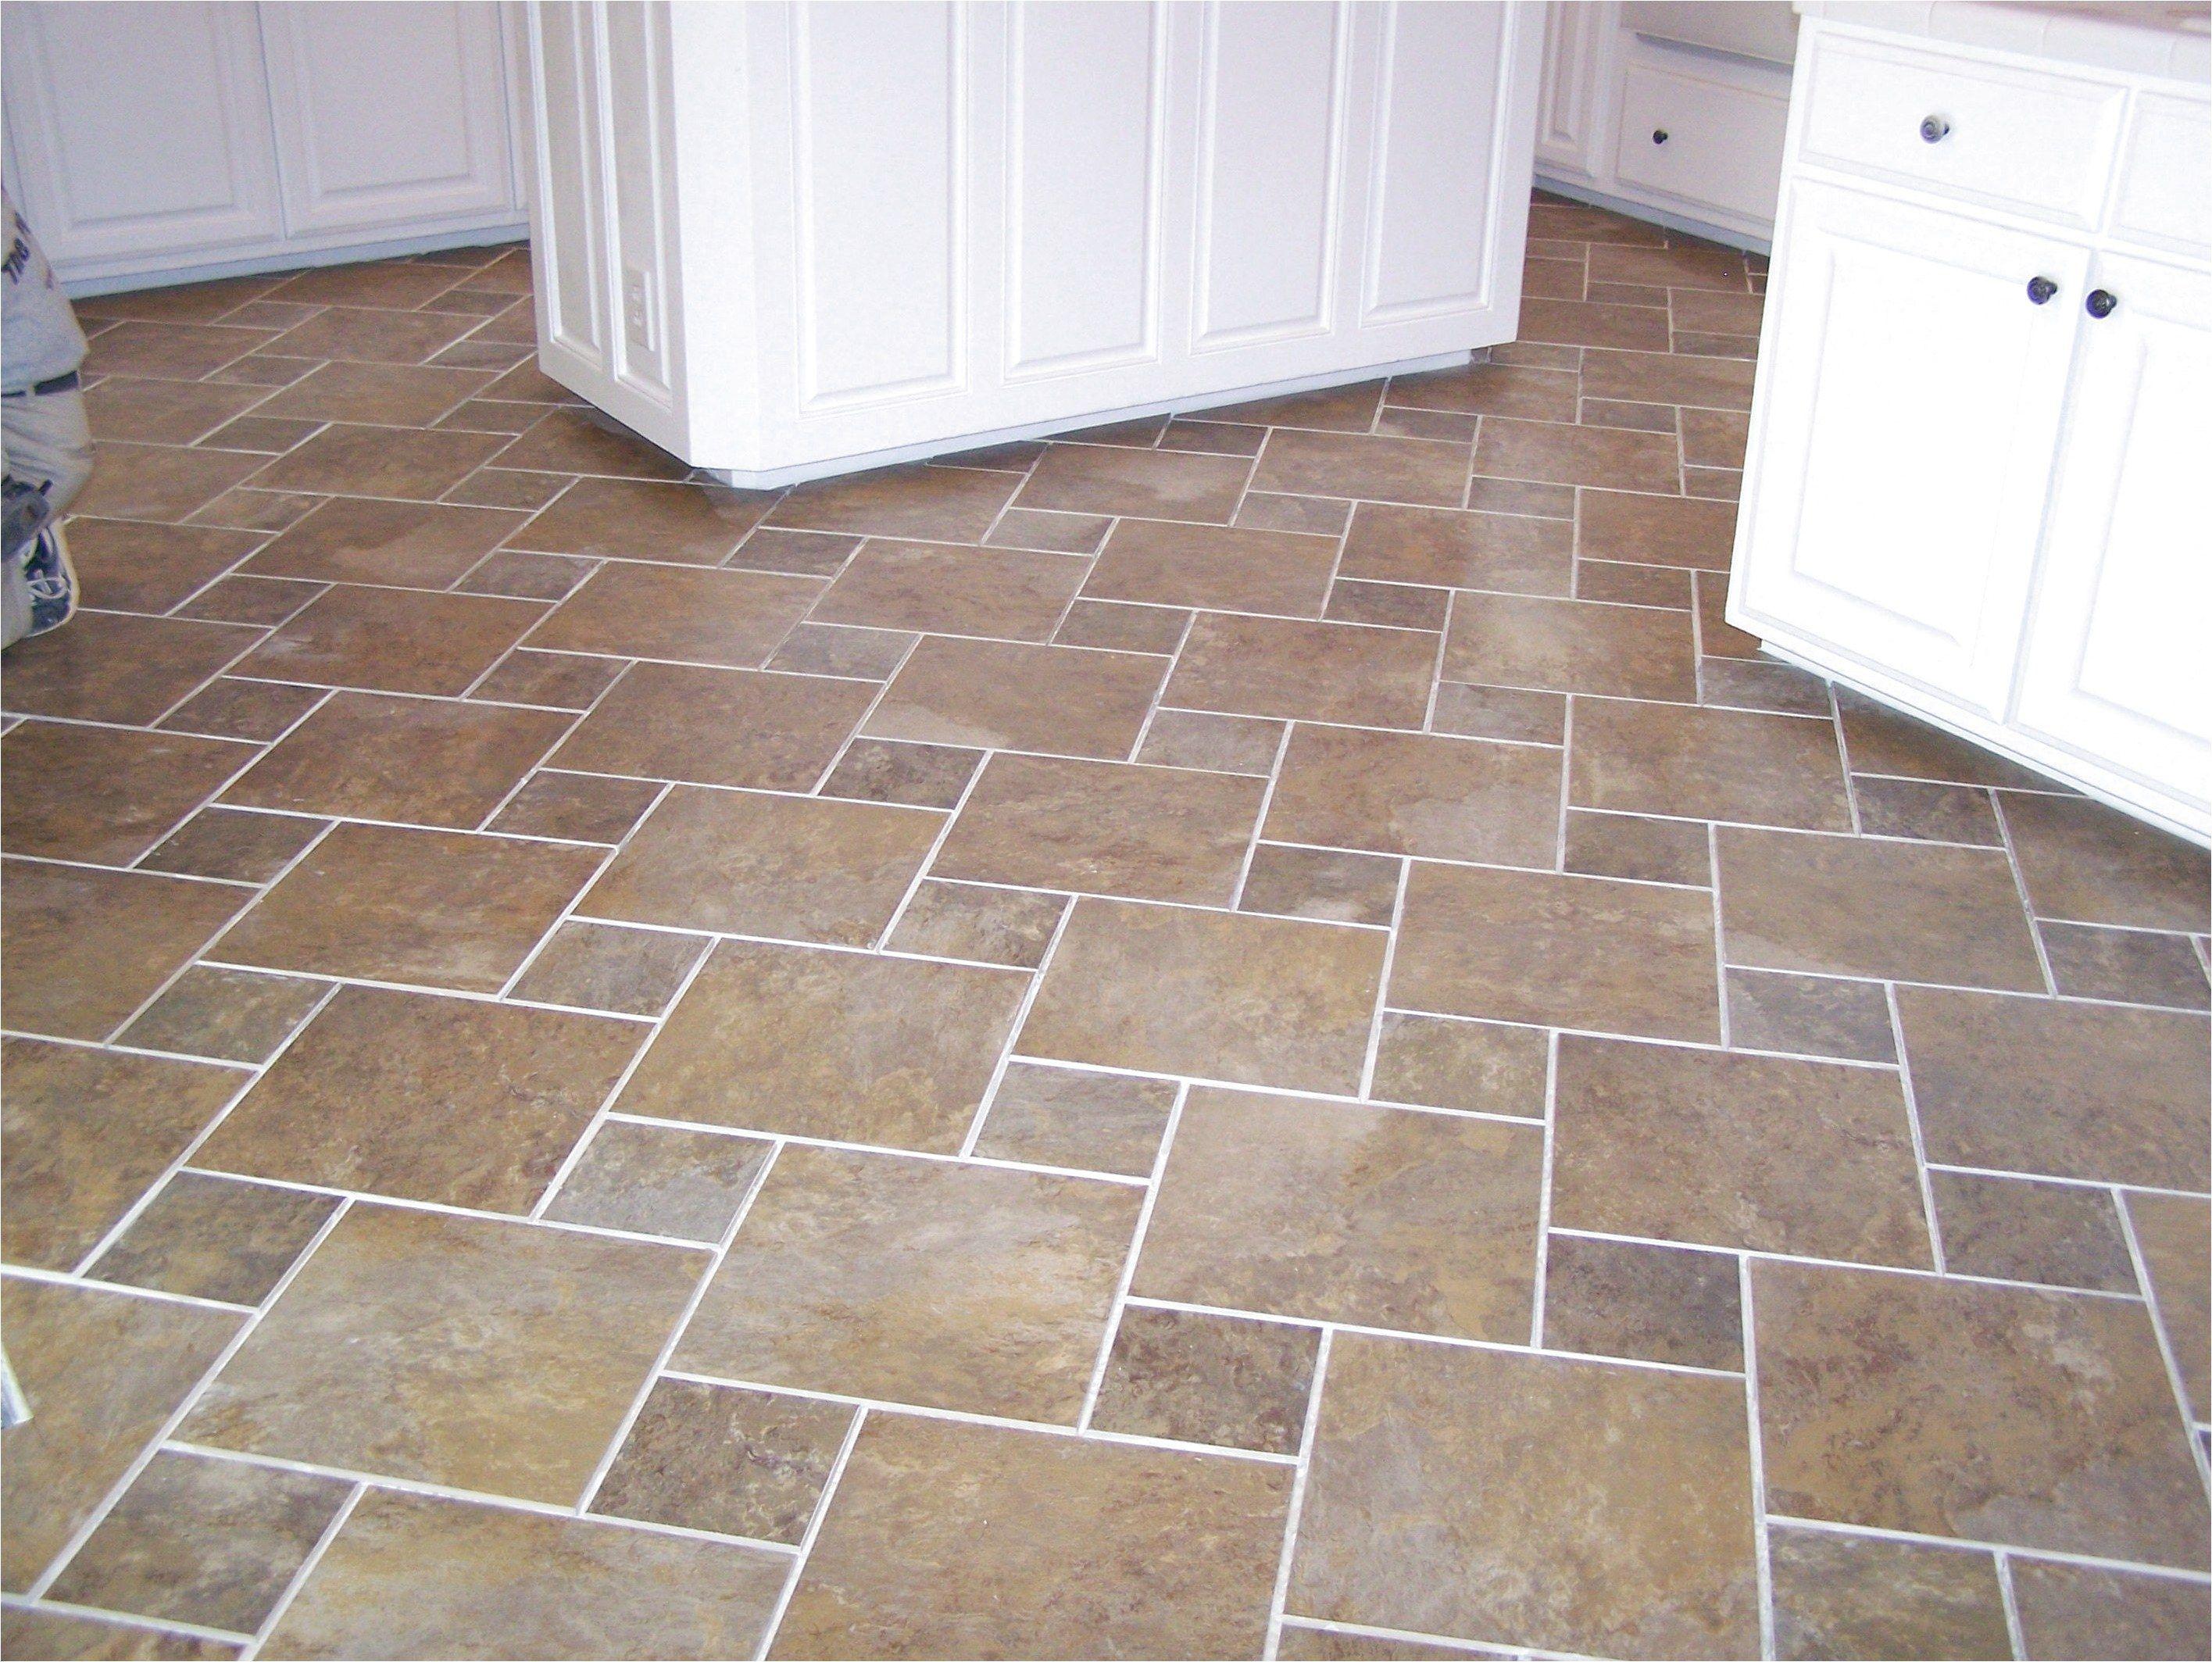 High Resolution Image Home Design Ideas Floor Tile Patterns